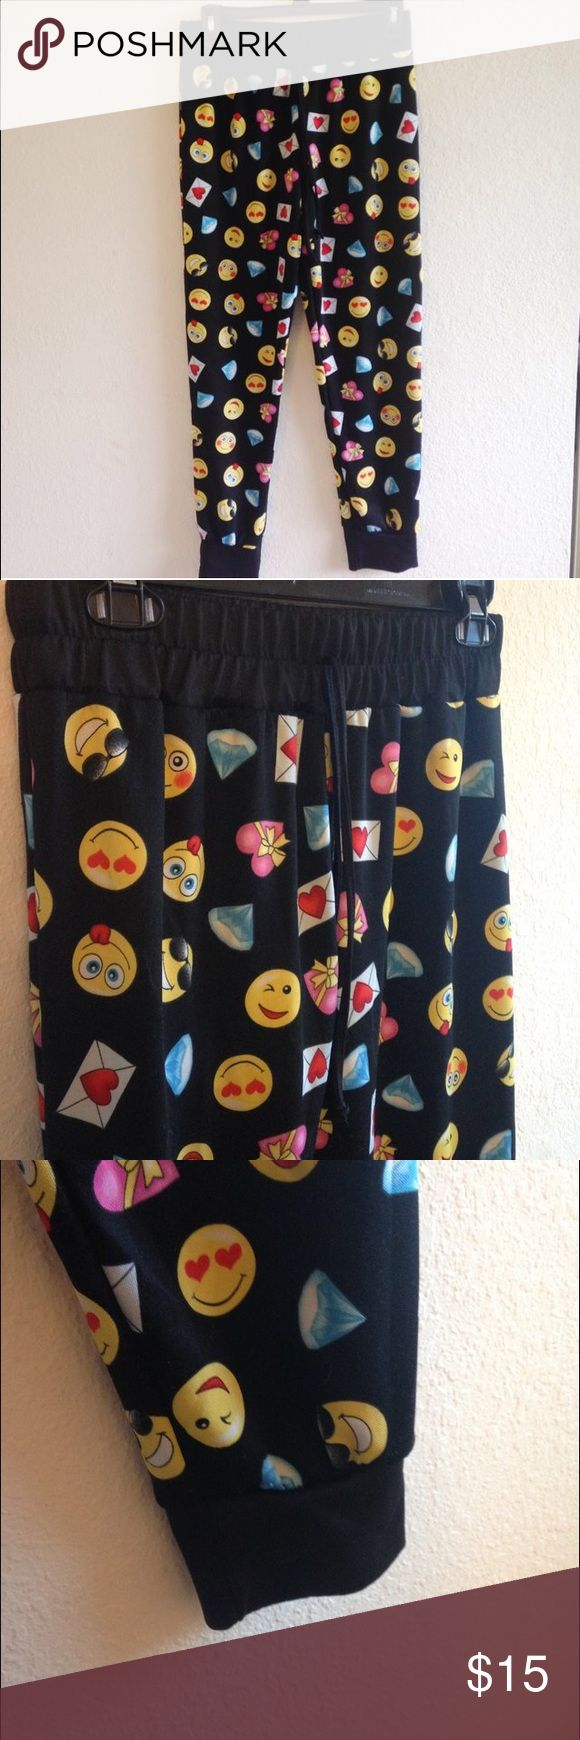 Emoji Jogger Pants Emoji jogger pants!!these are super adorable and comfy!!  #joggers #sweatpants #emoji #forever21 #dance #athleticwear #athletic #lululemon #pink #vspink #sale #clearance #oldnavy #gap #hm #pants #jeans #shorts #dress #skirt #fashion #cute Pants Track Pants & Joggers